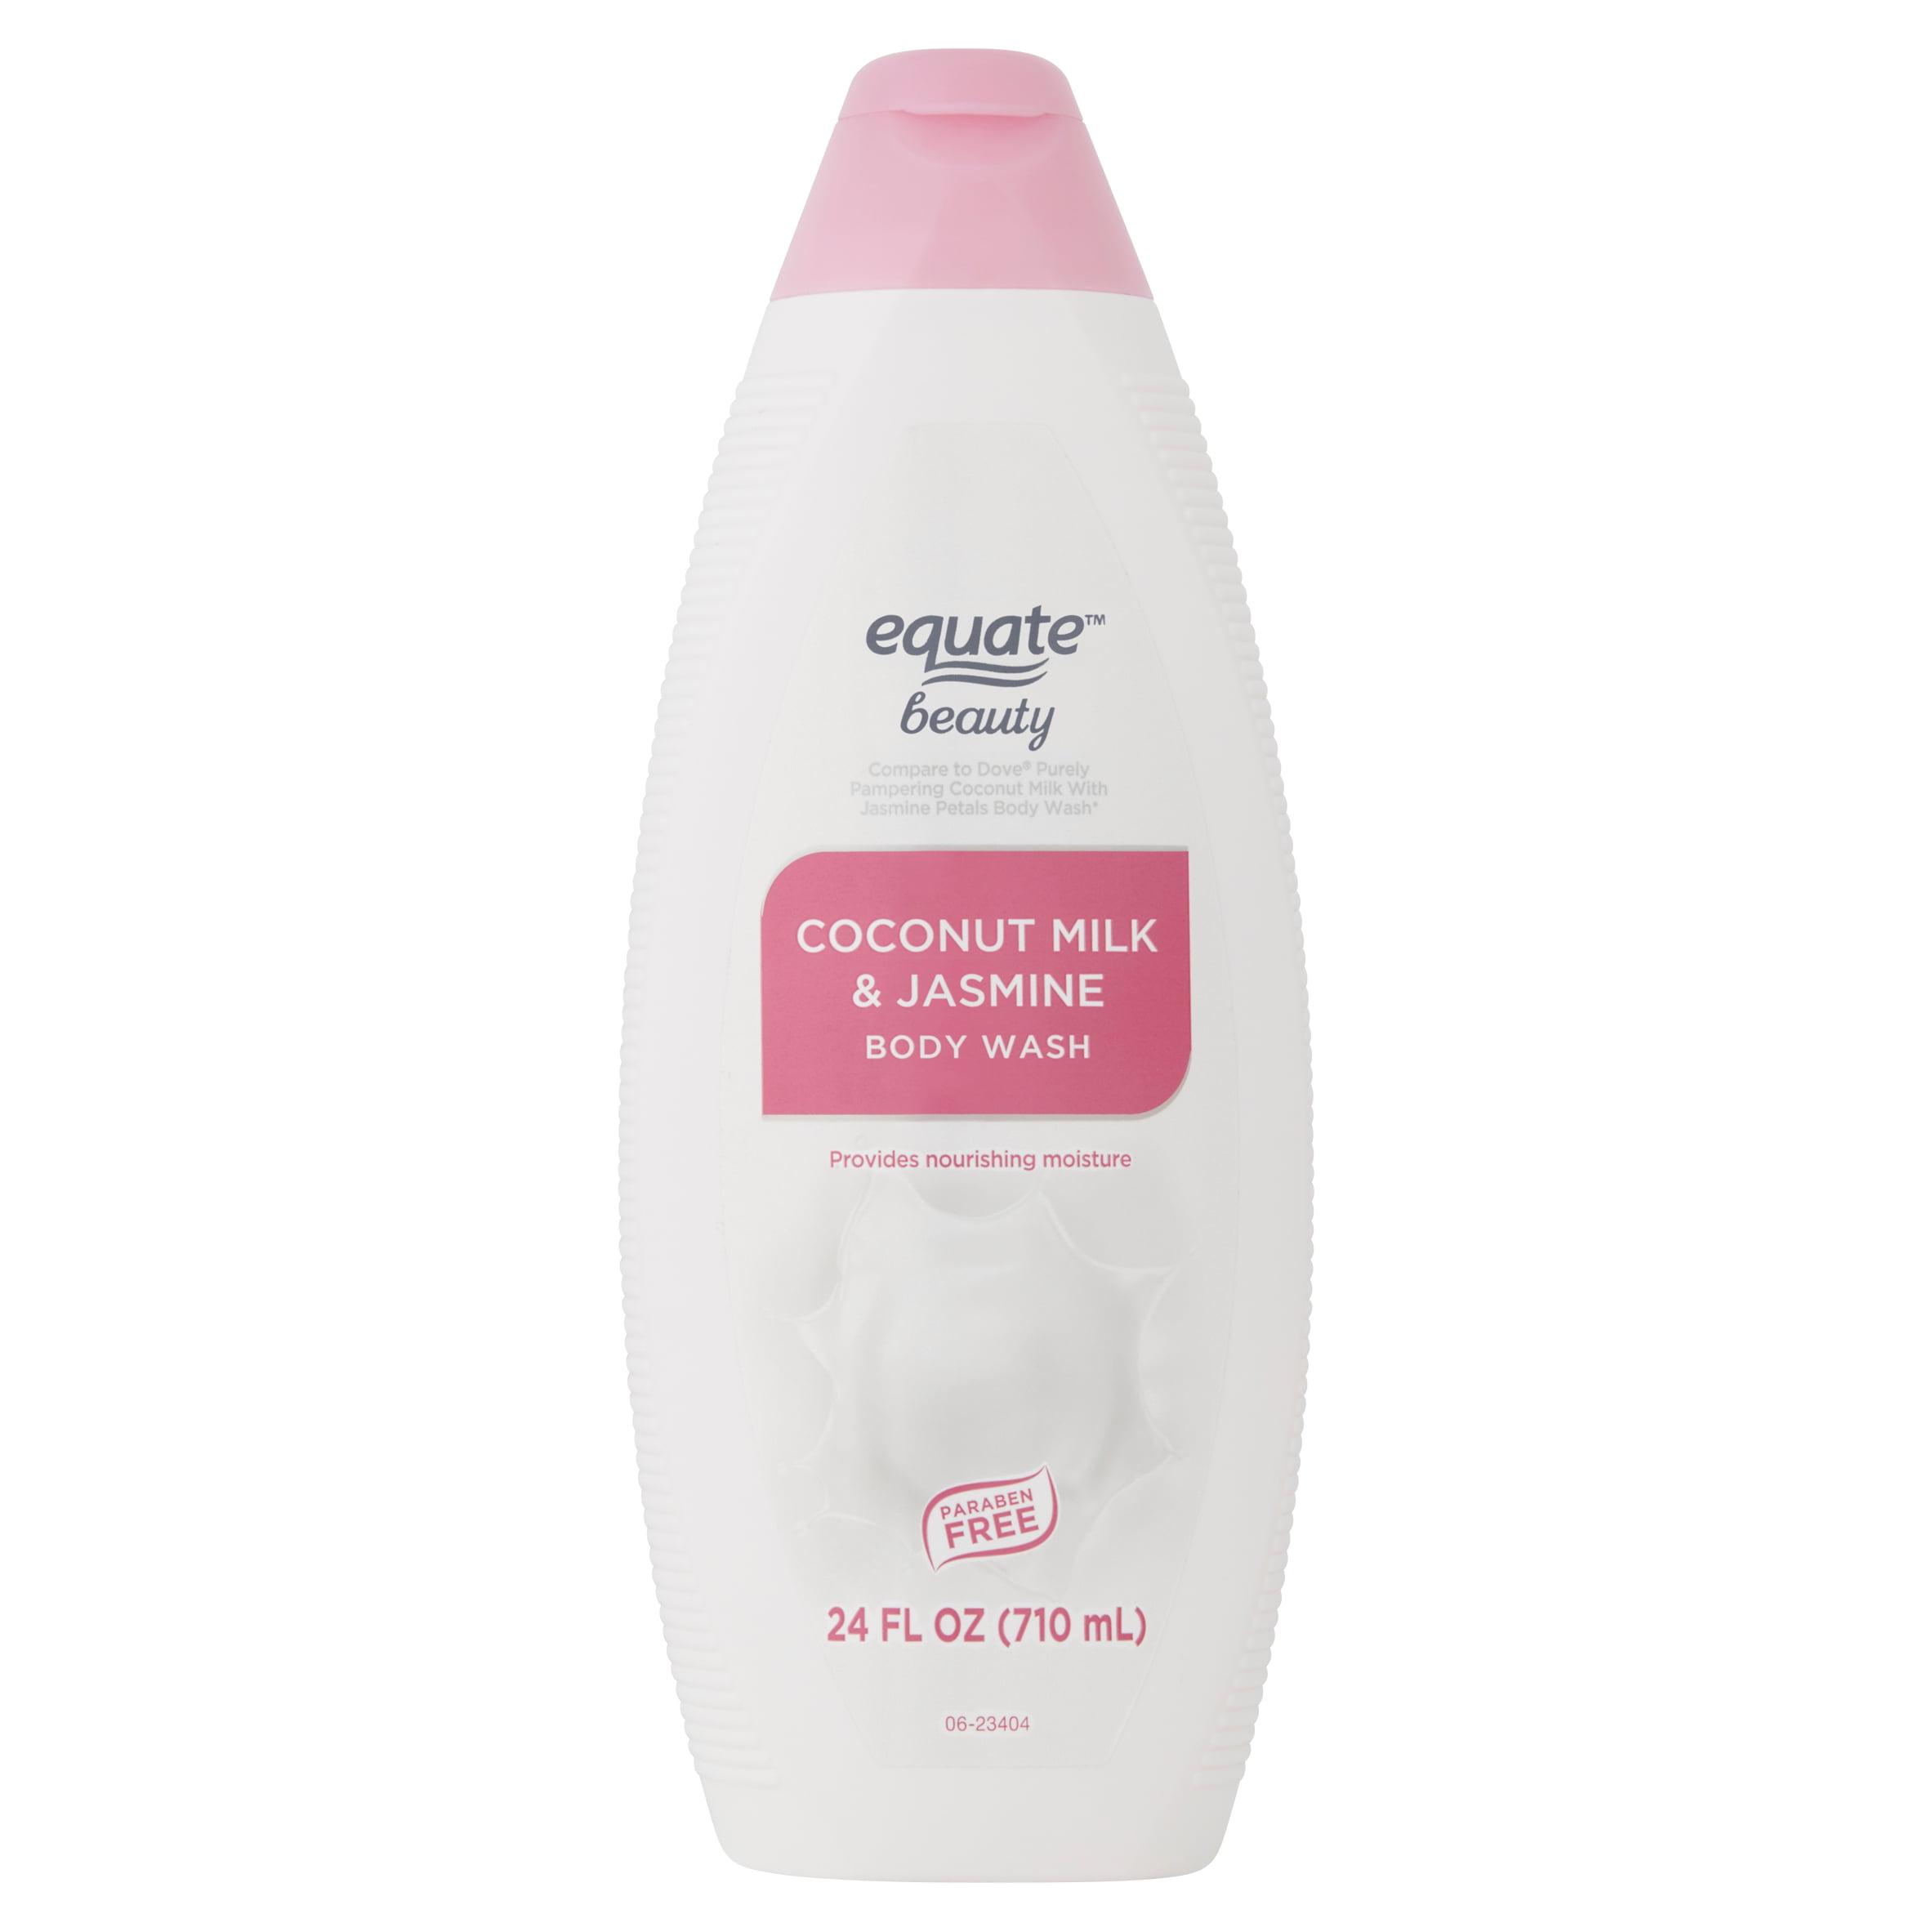 Equate Beauty Coconut Milk Jasmine Body Wash 24 Fl Oz Walmart Com Walmart Com